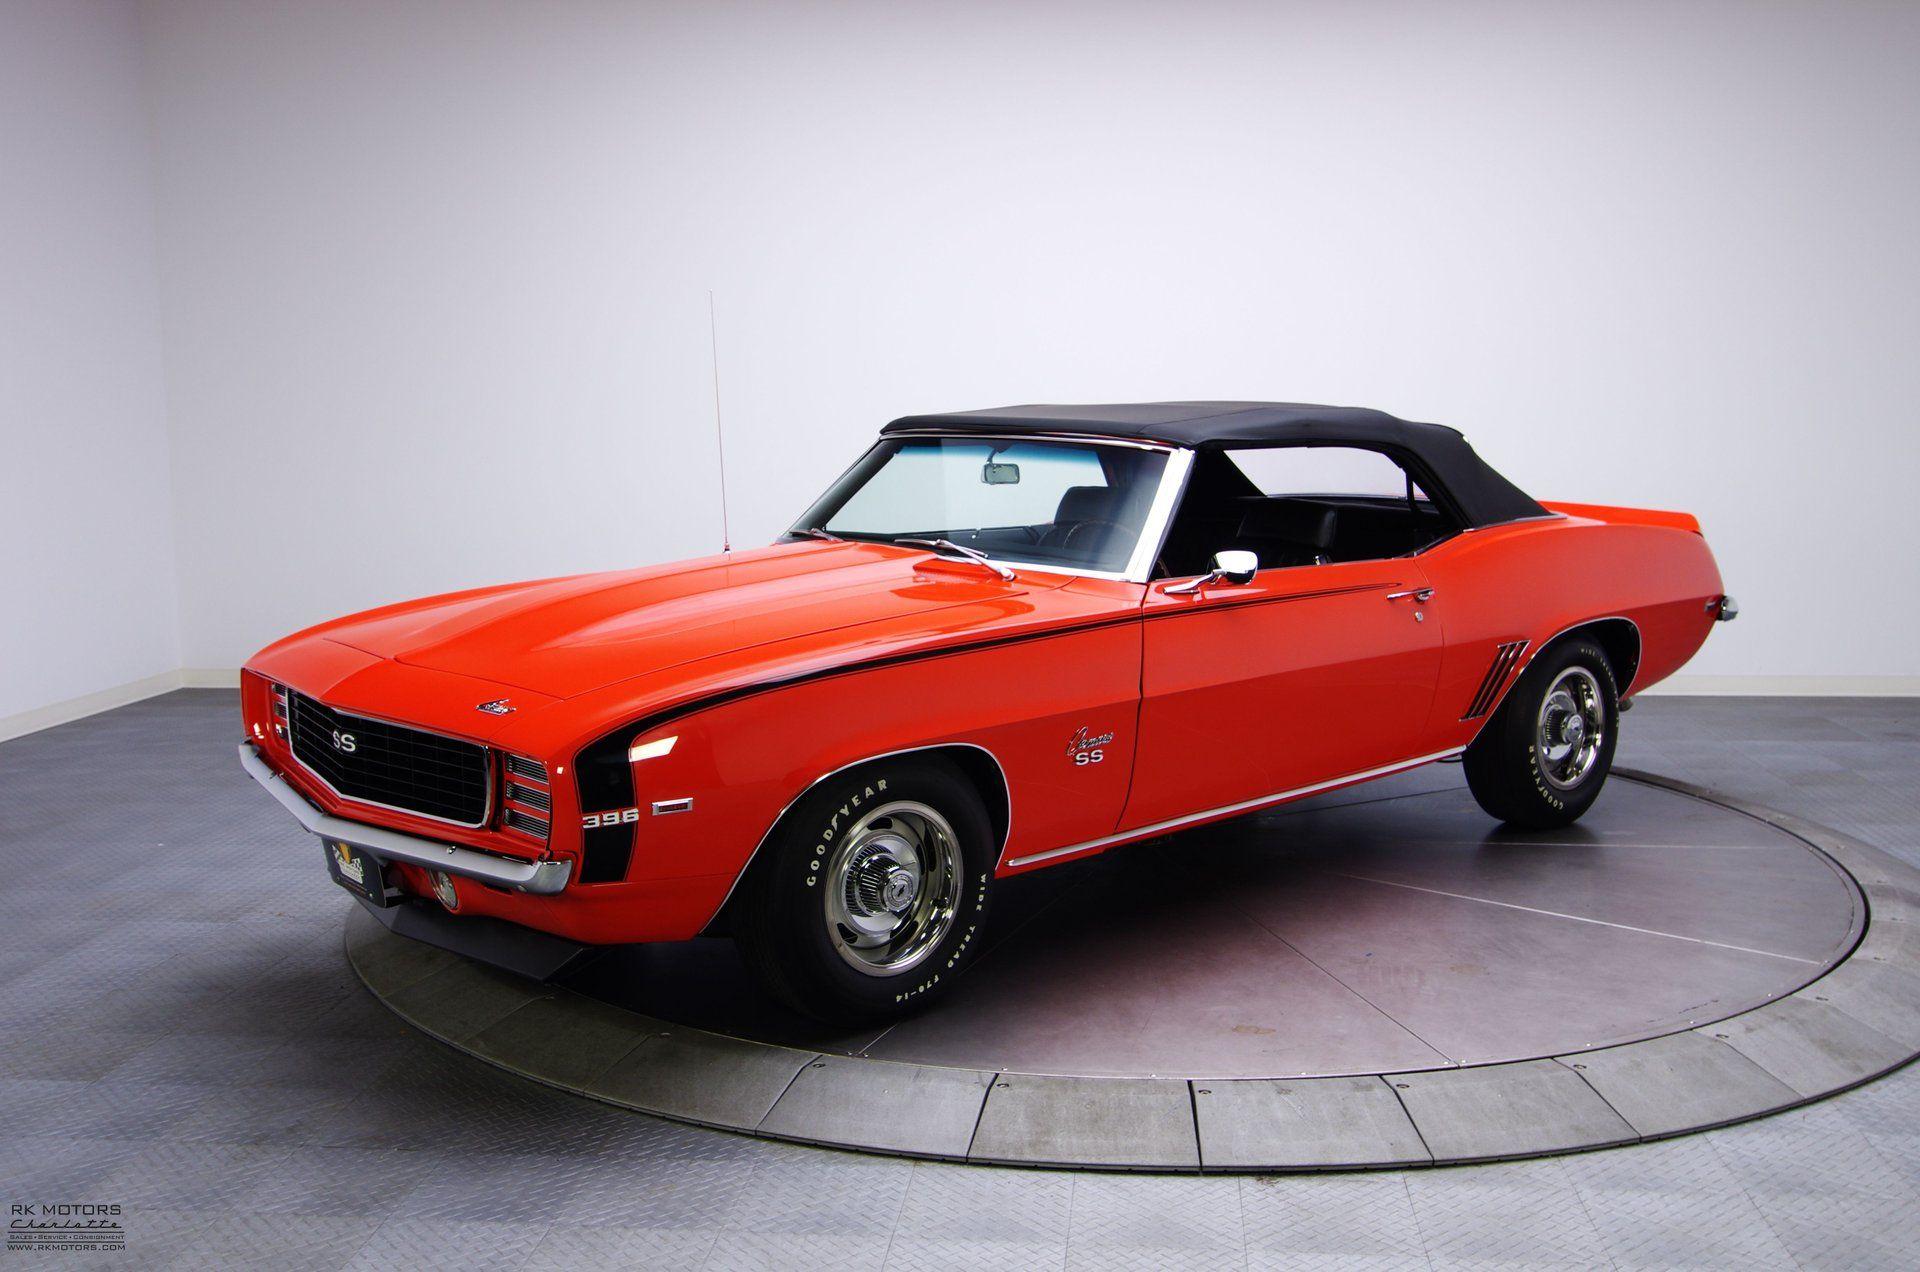 132613 1969 chevrolet camaro rk motors classic cars and